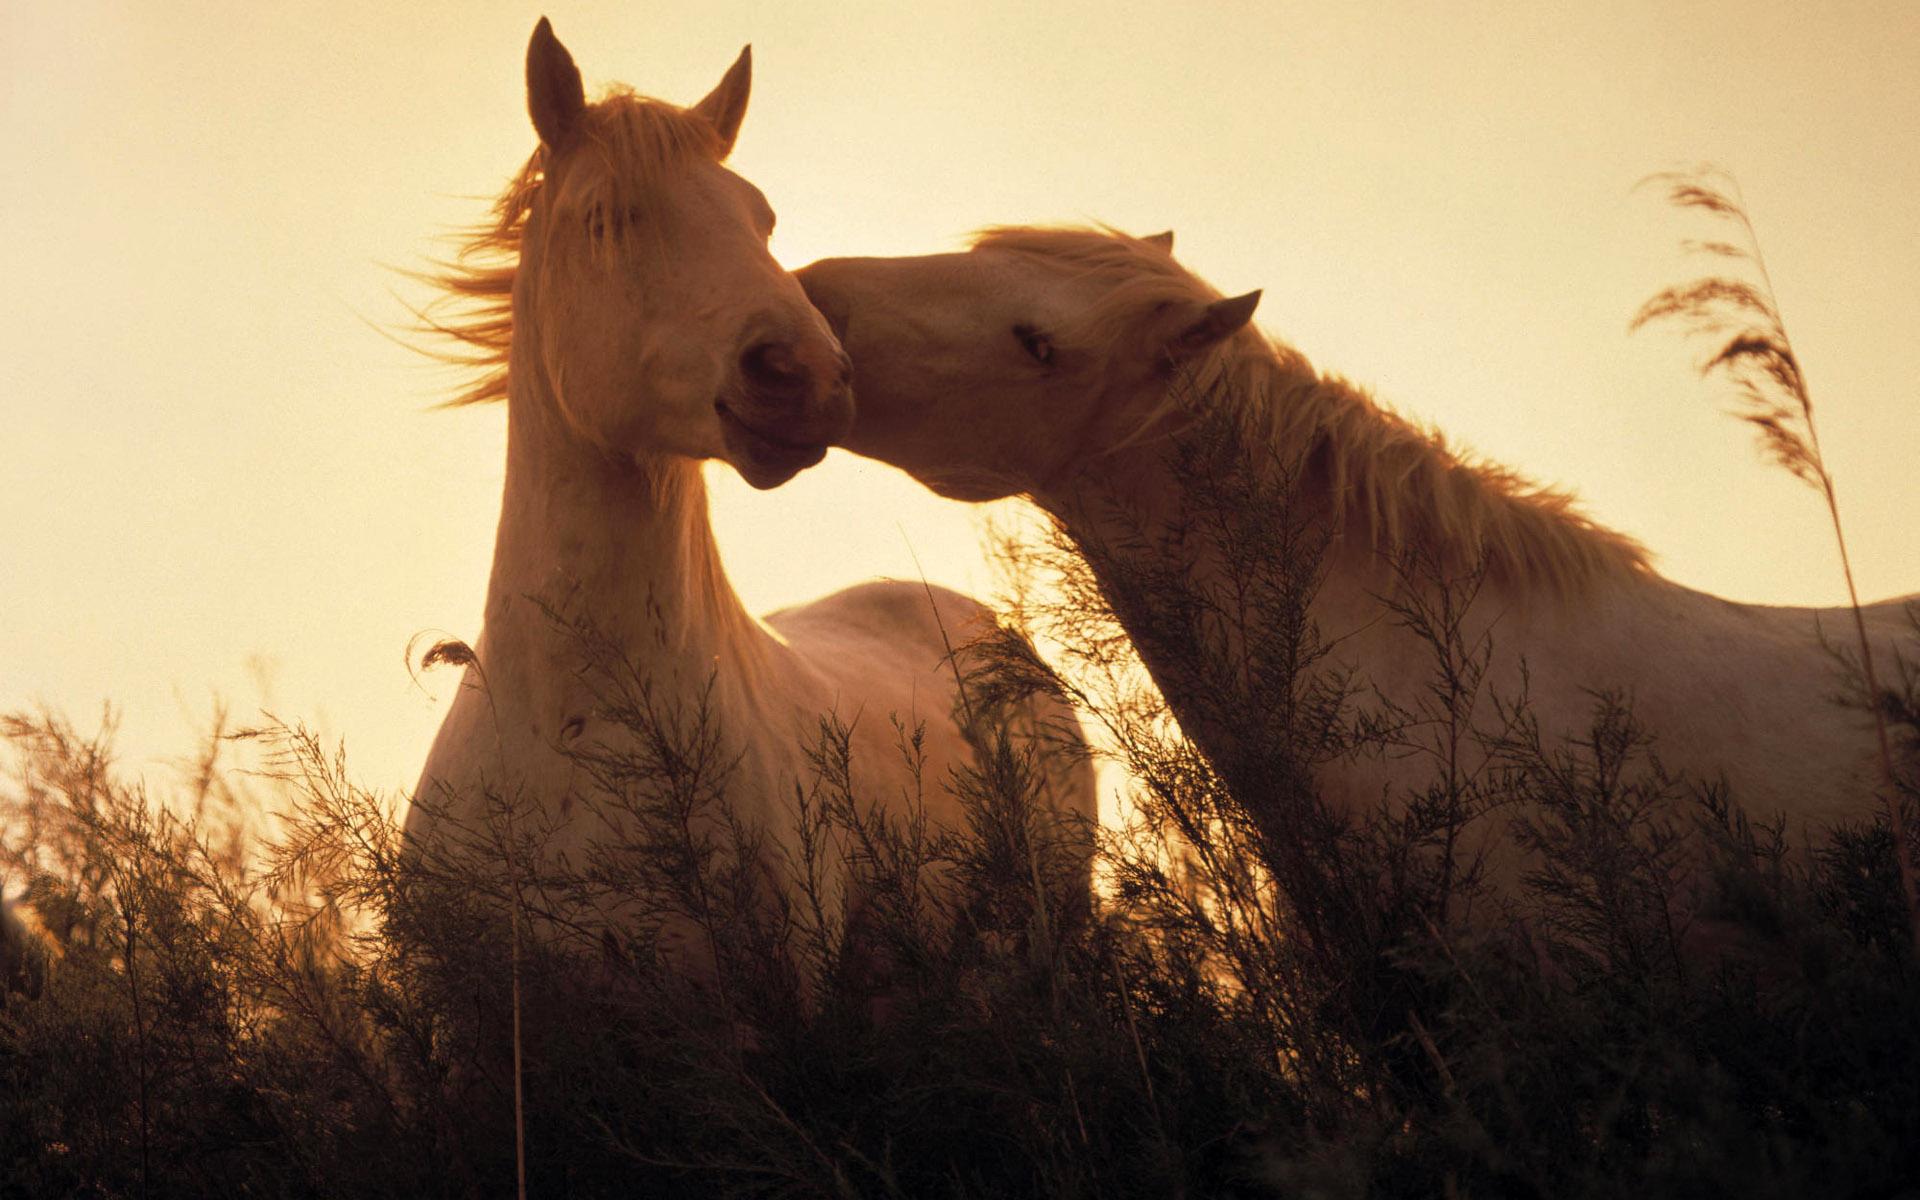 cute horse desktop wallpaper 59330